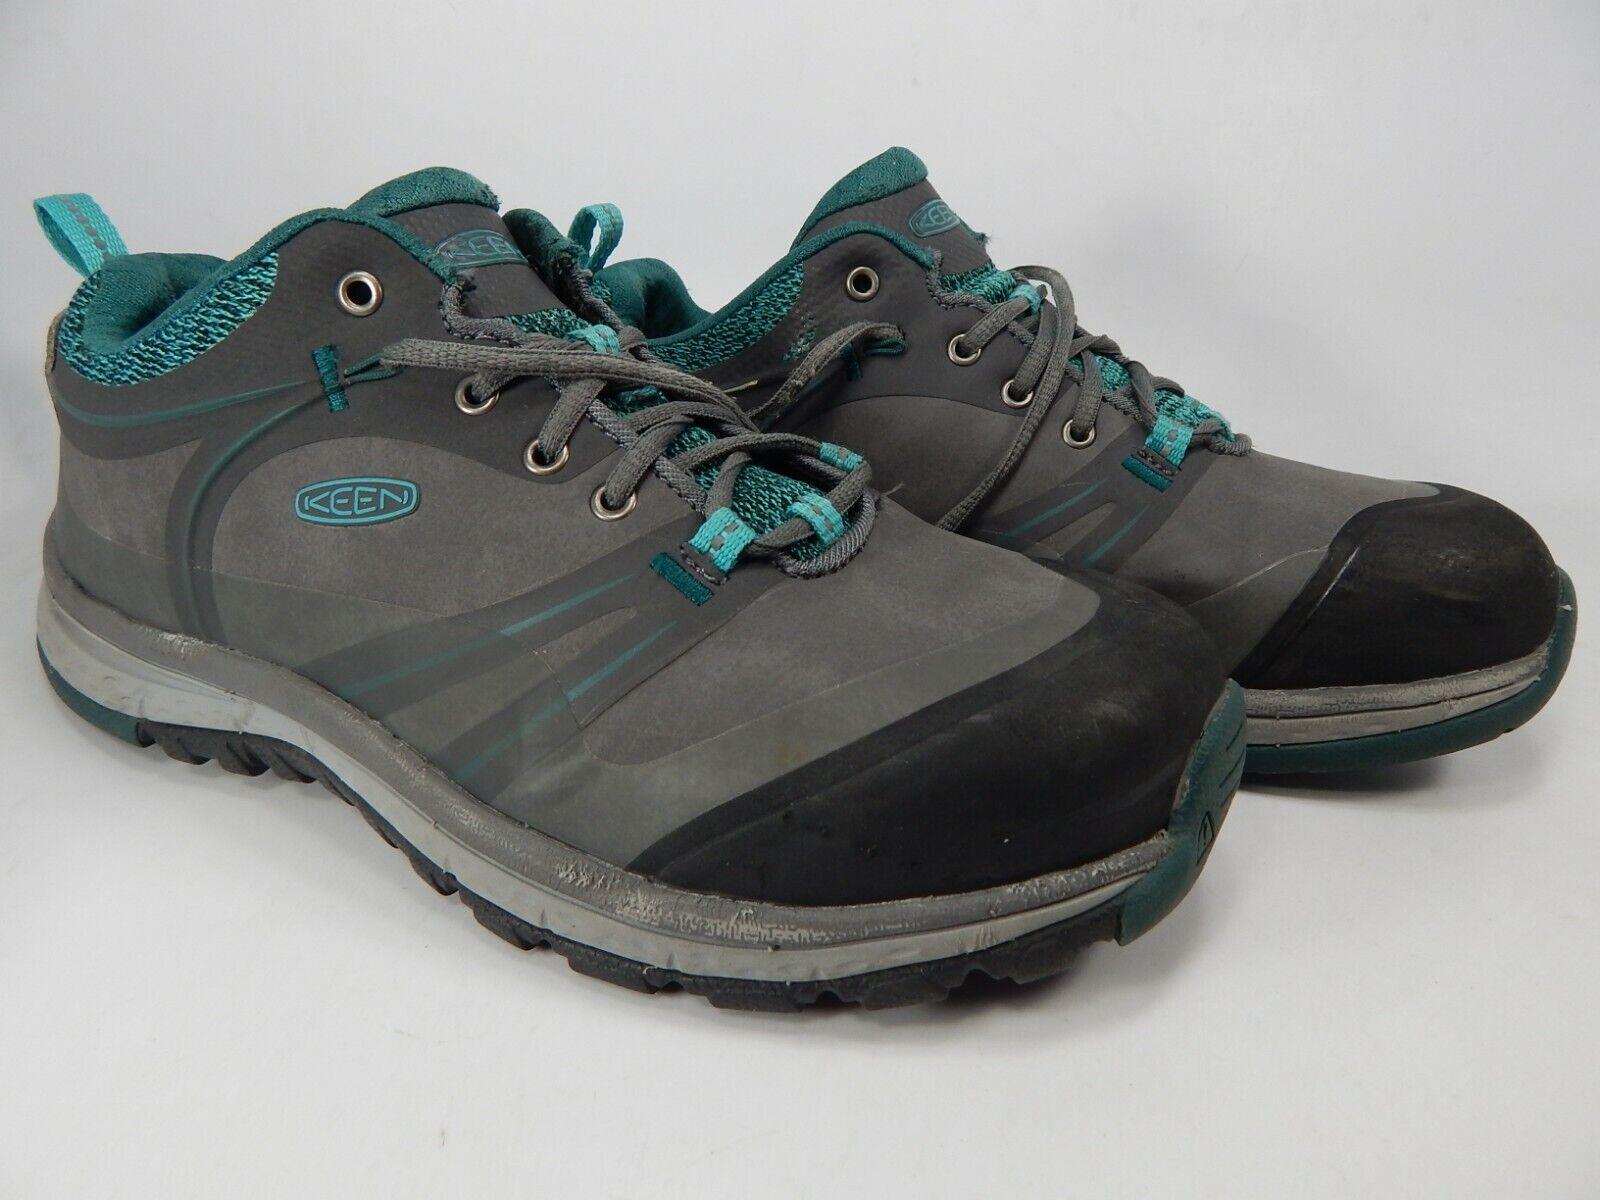 Keen Sedona Pulse Low Sz 7 M (B) EU 37.5 Women's Aluminum Toe Work shoes 1018634